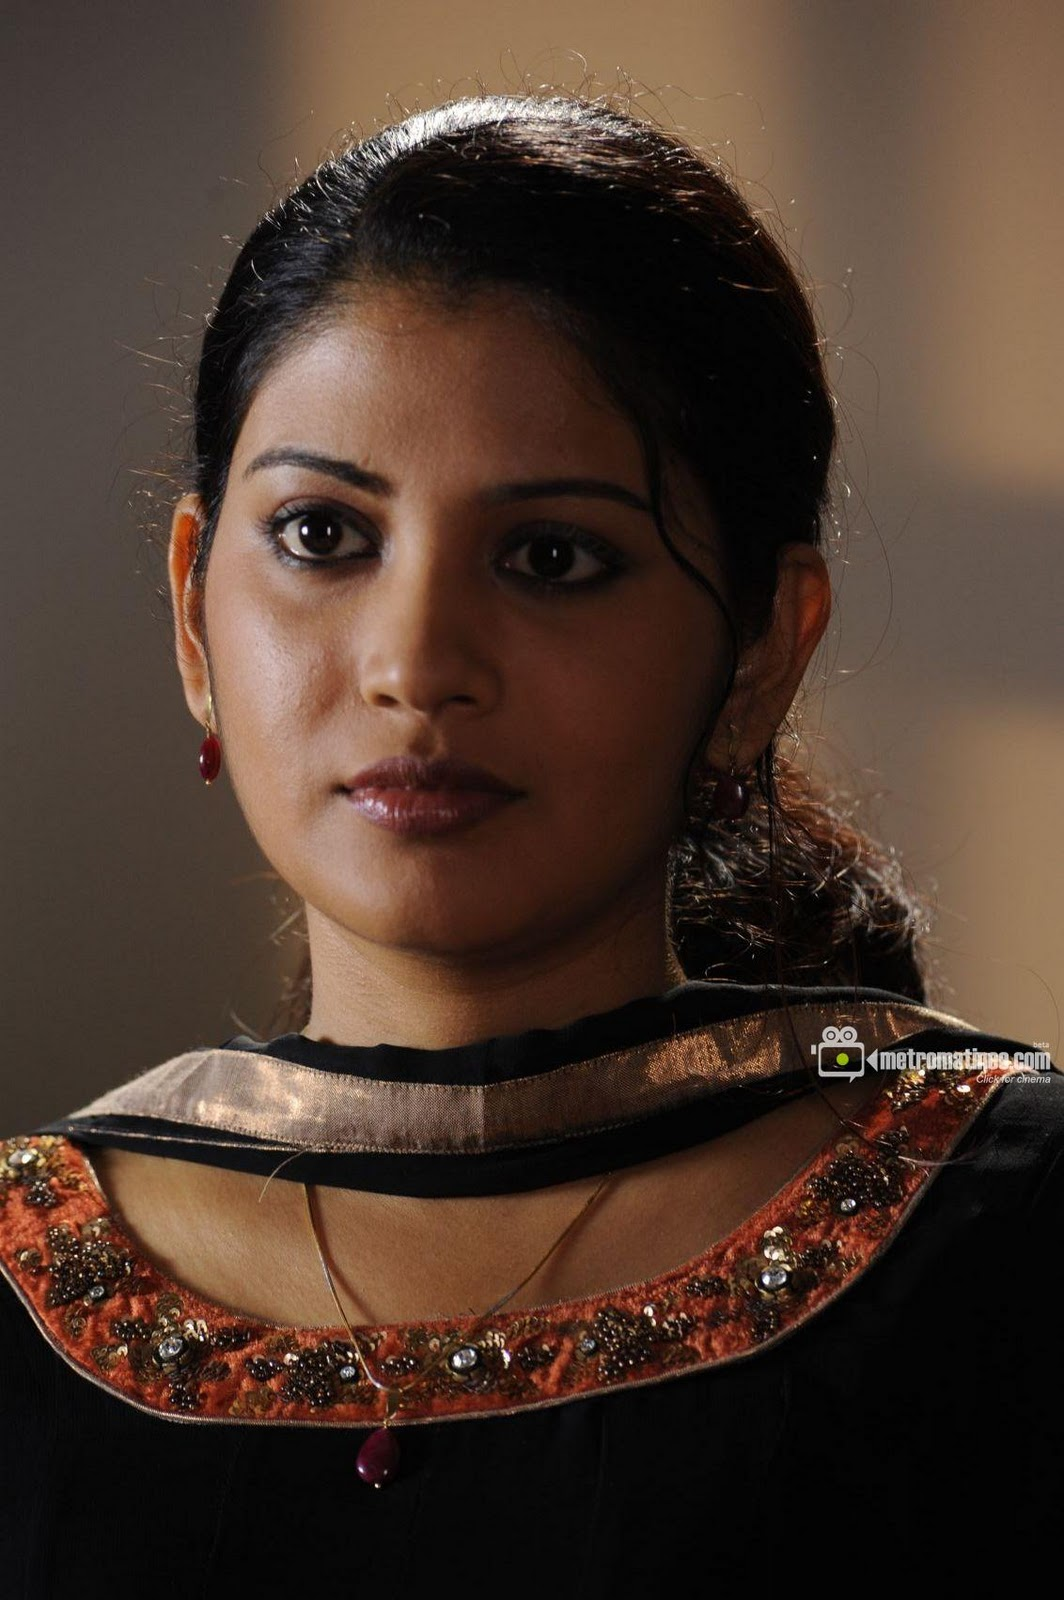 malayalam film database living together 5